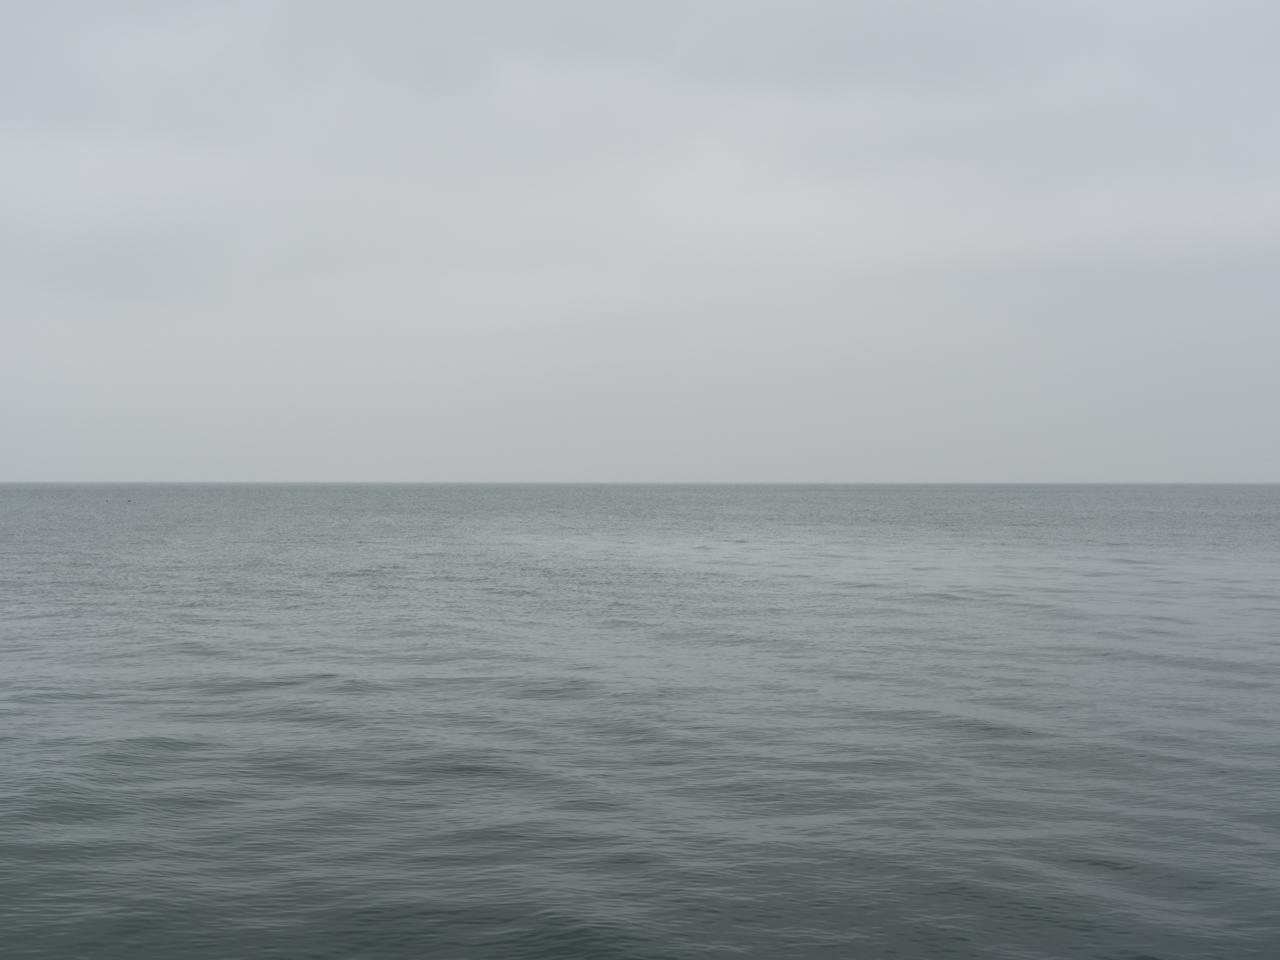 A gray morning on Lake Michigan with a gray green lake